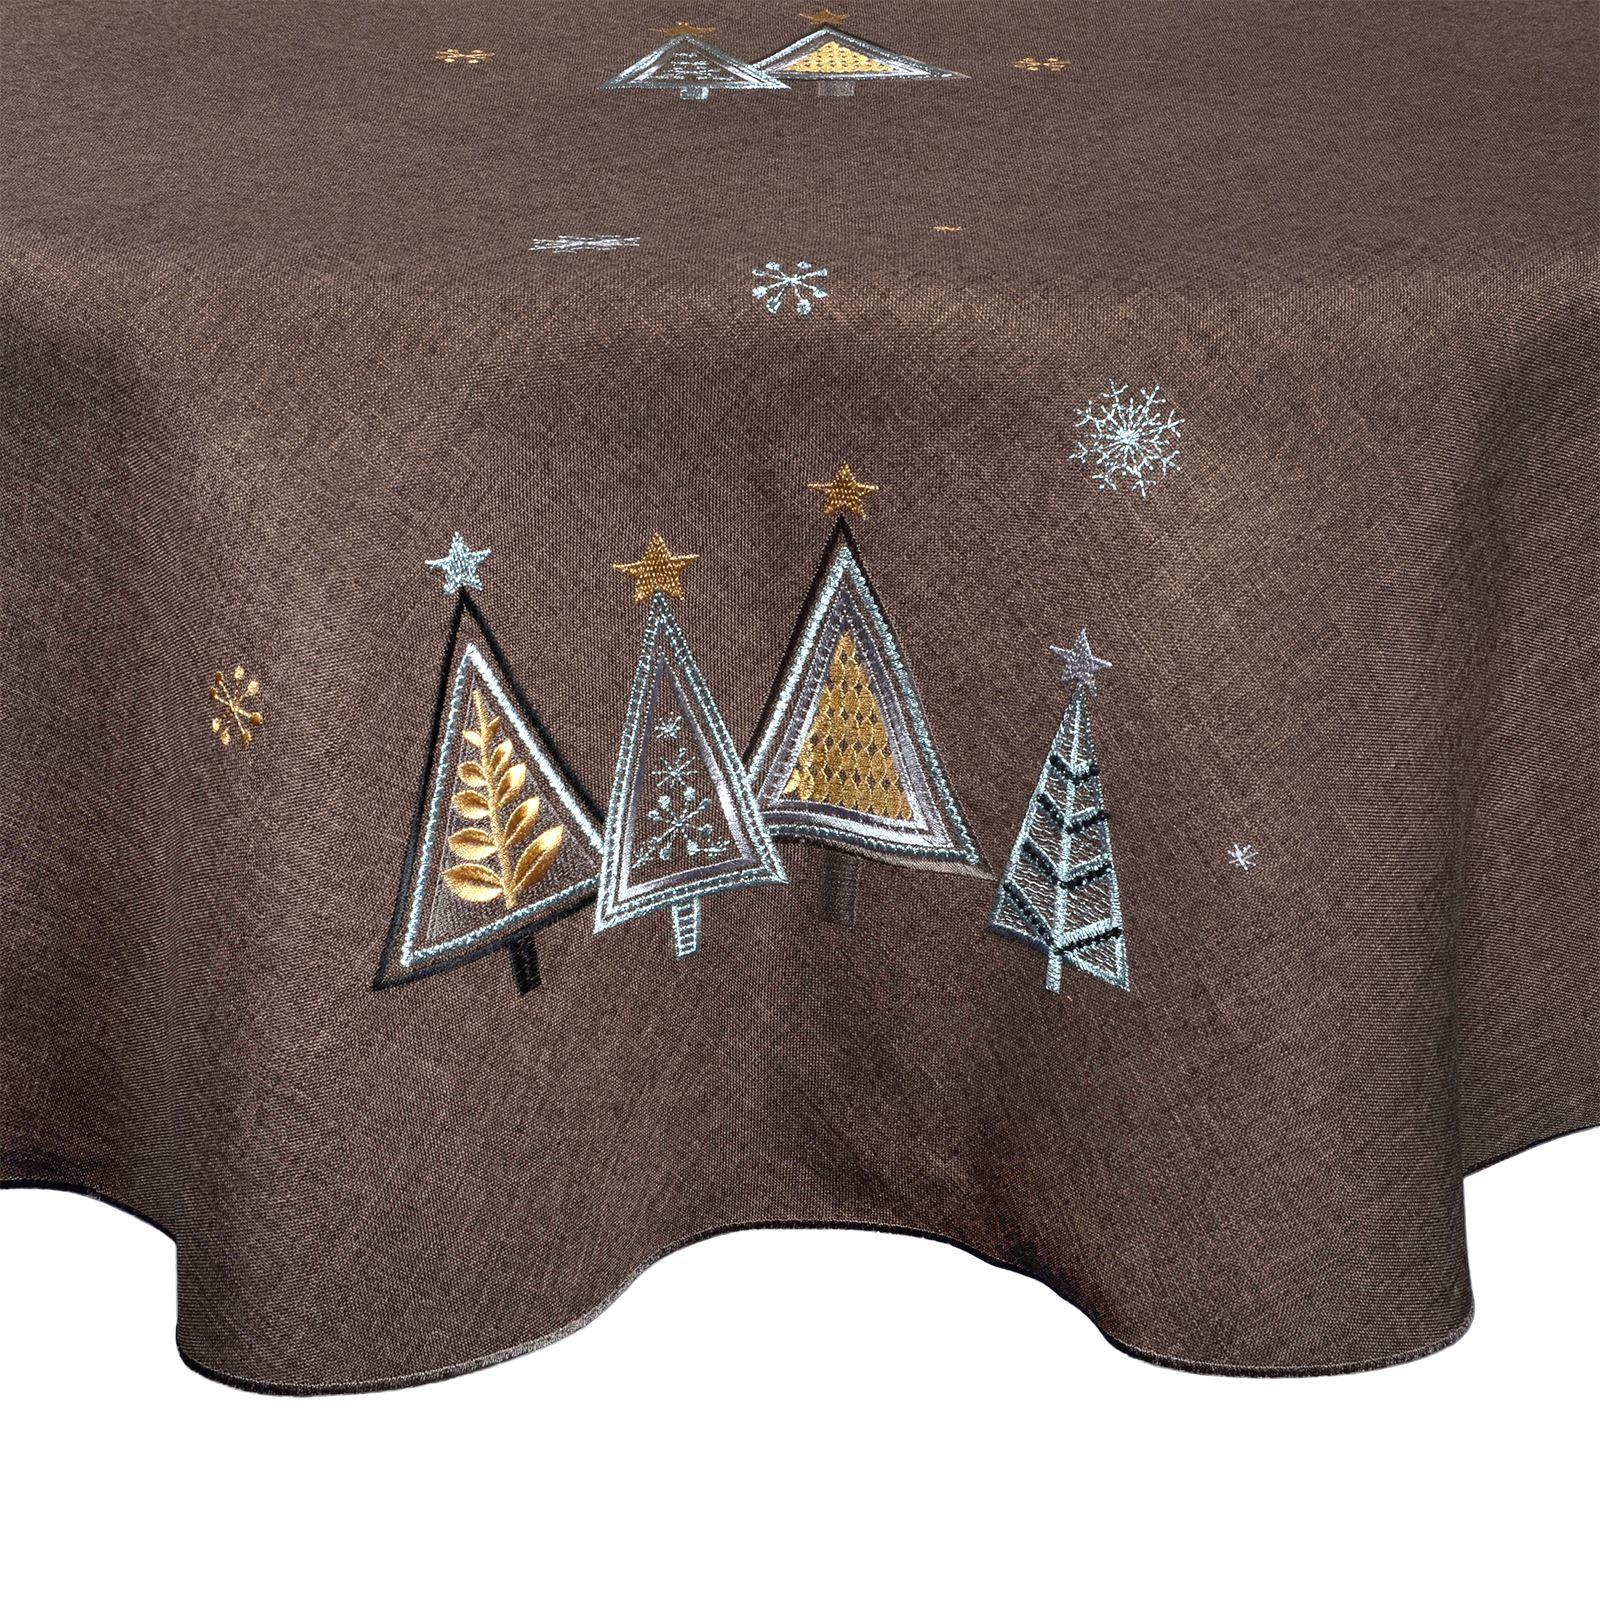 Christmas-Tablecloth-Festive-Pattern-Rectangle-Round-Fabric-Xmas-Room-Decoration Indexbild 27